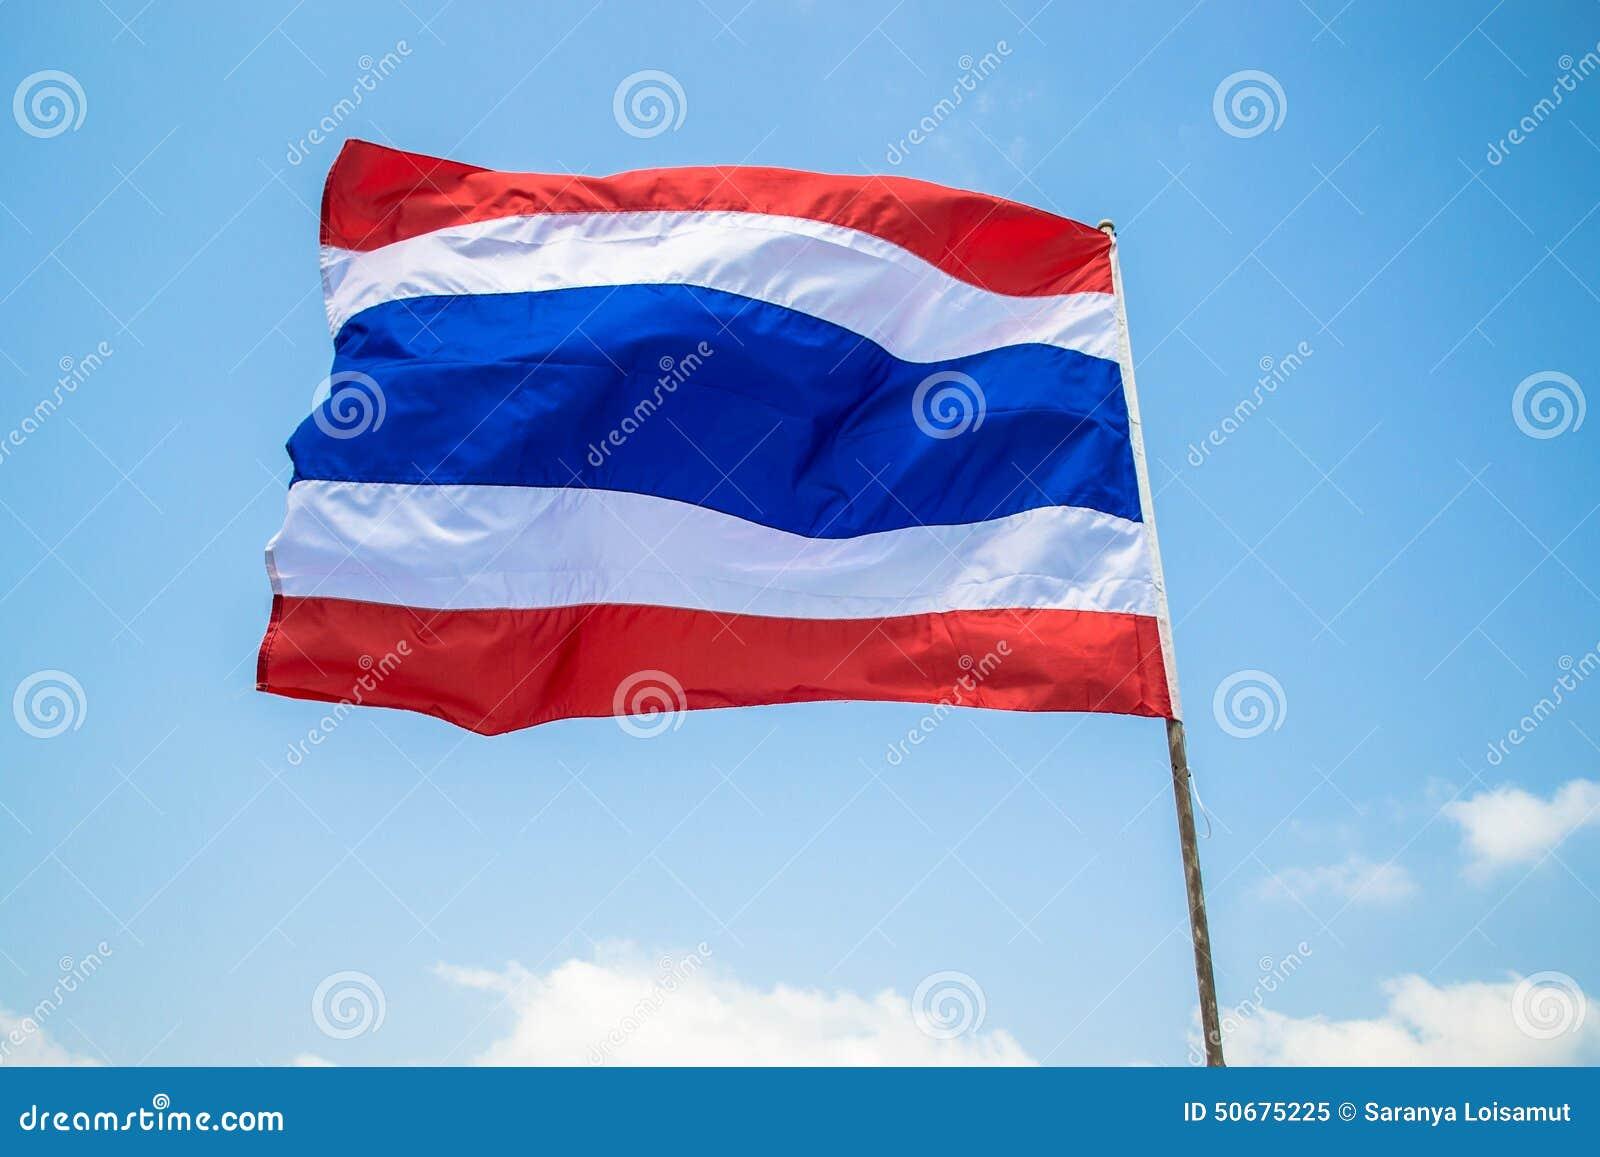 Download 标志泰国 库存图片. 图片 包括有 分别, 爱国, 瓶颈, 旗竿, 国家(地区), 其次, 国籍, d0 - 50675225